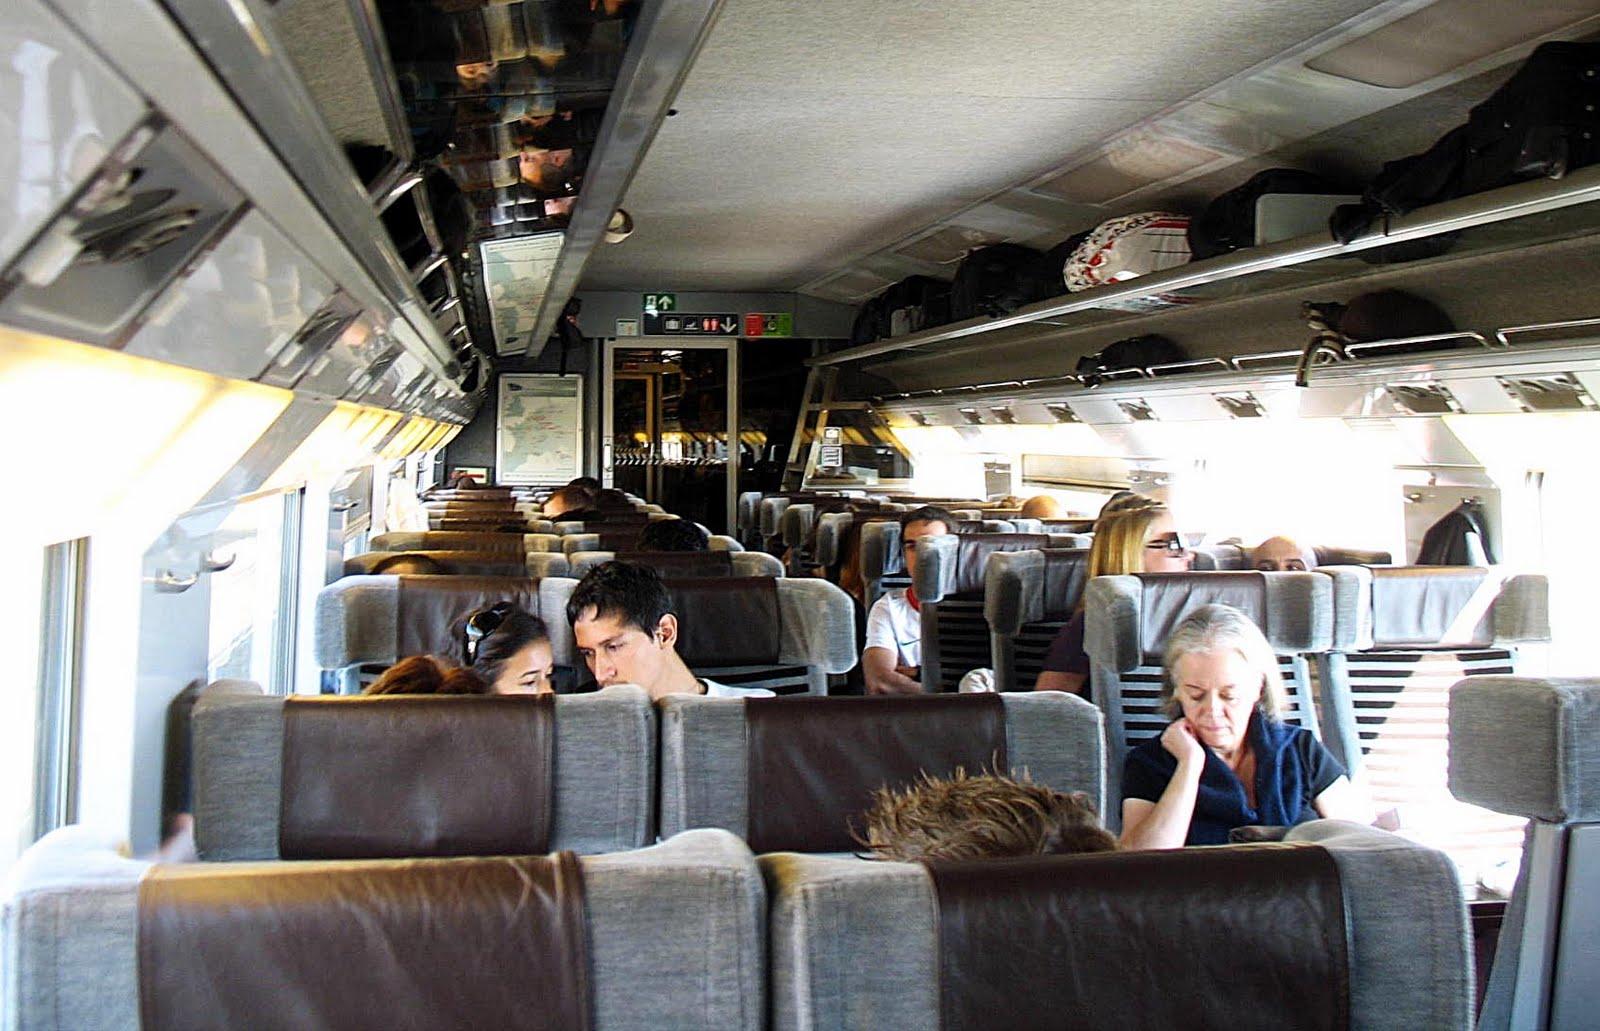 paris london train